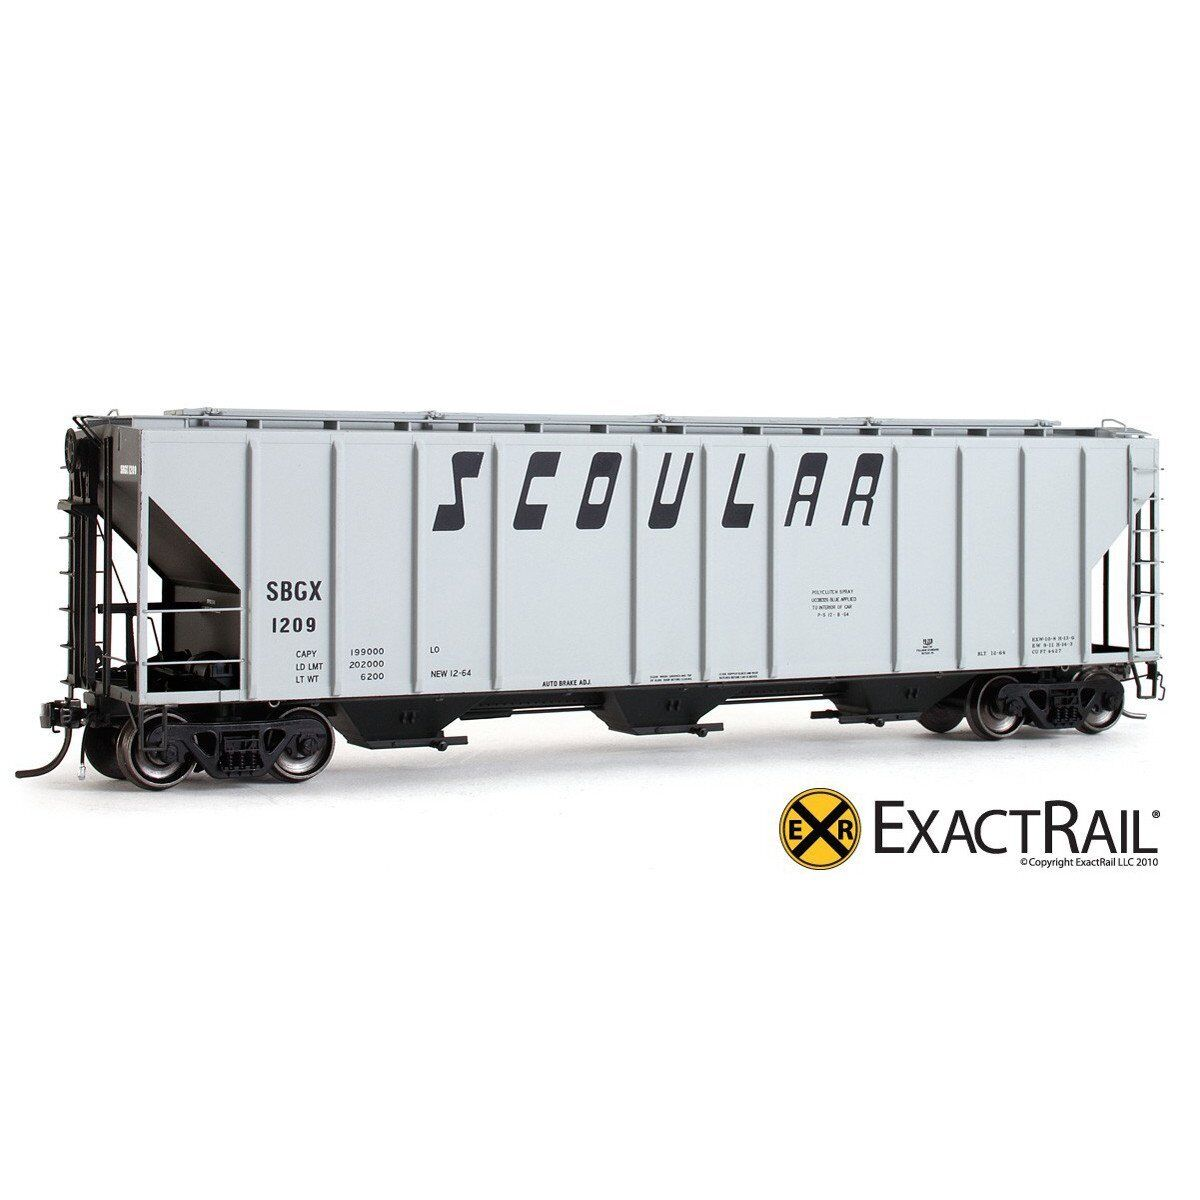 EXACTRAIL HO Scoular PS-2CD 4427 Covered Hopper SBGX EP-80178-4